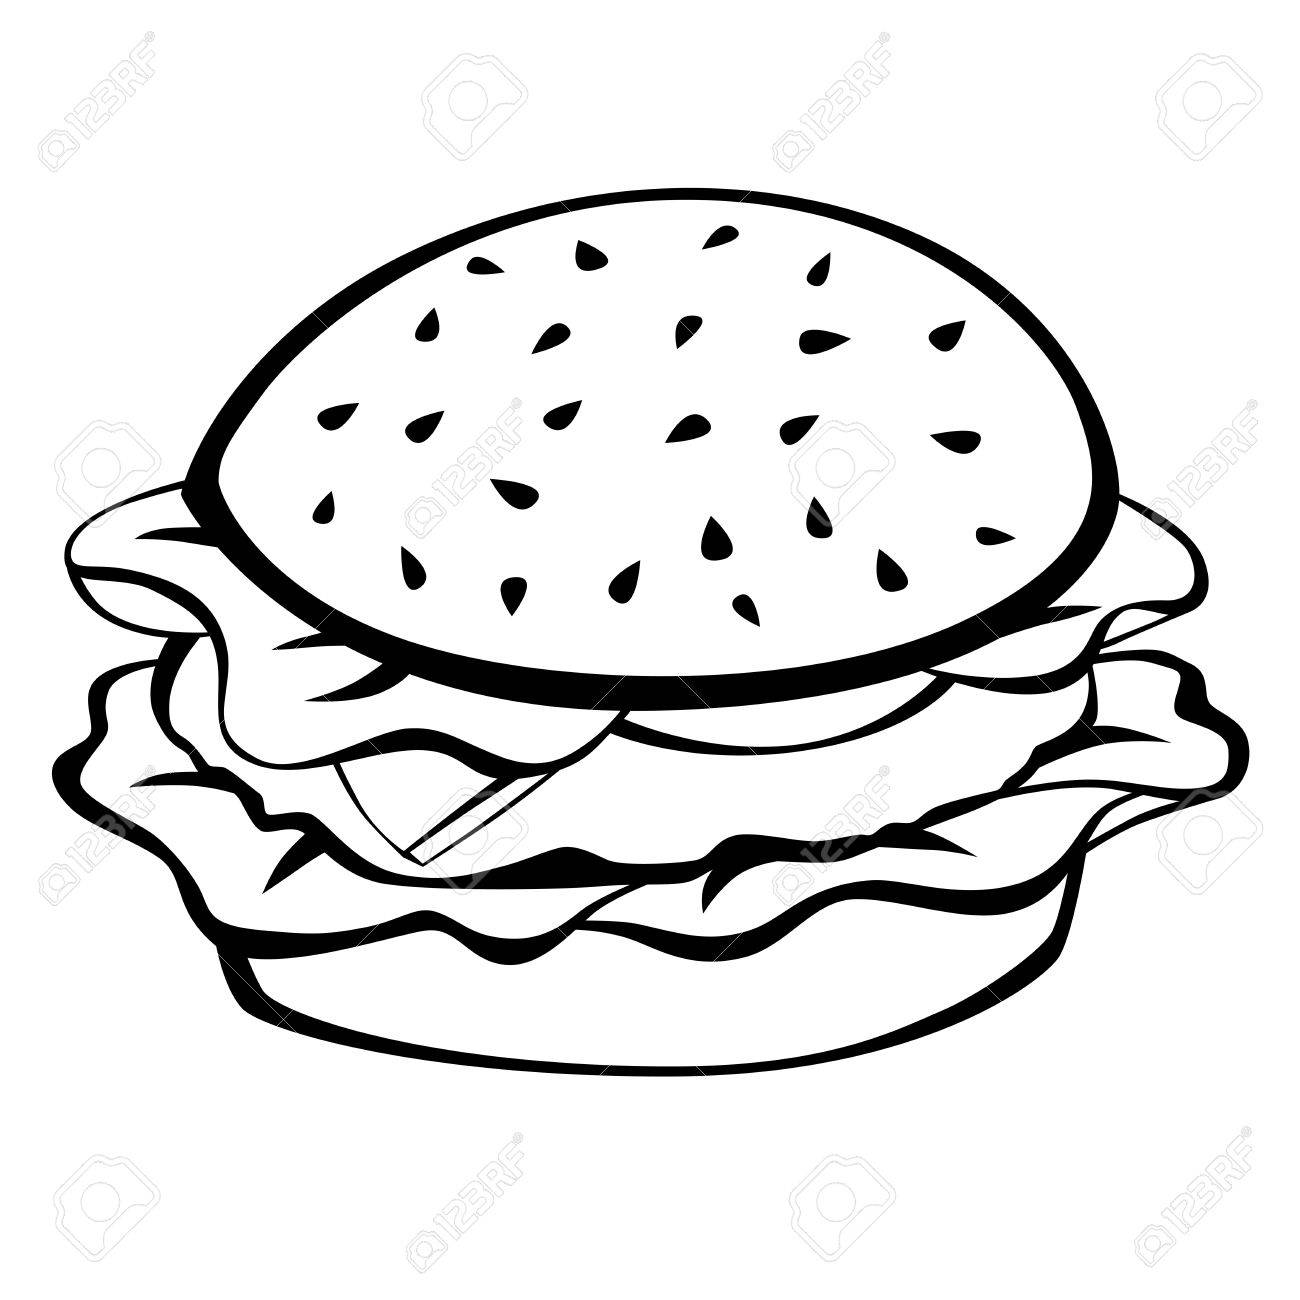 Black white hamburger food isolated illustration vector.